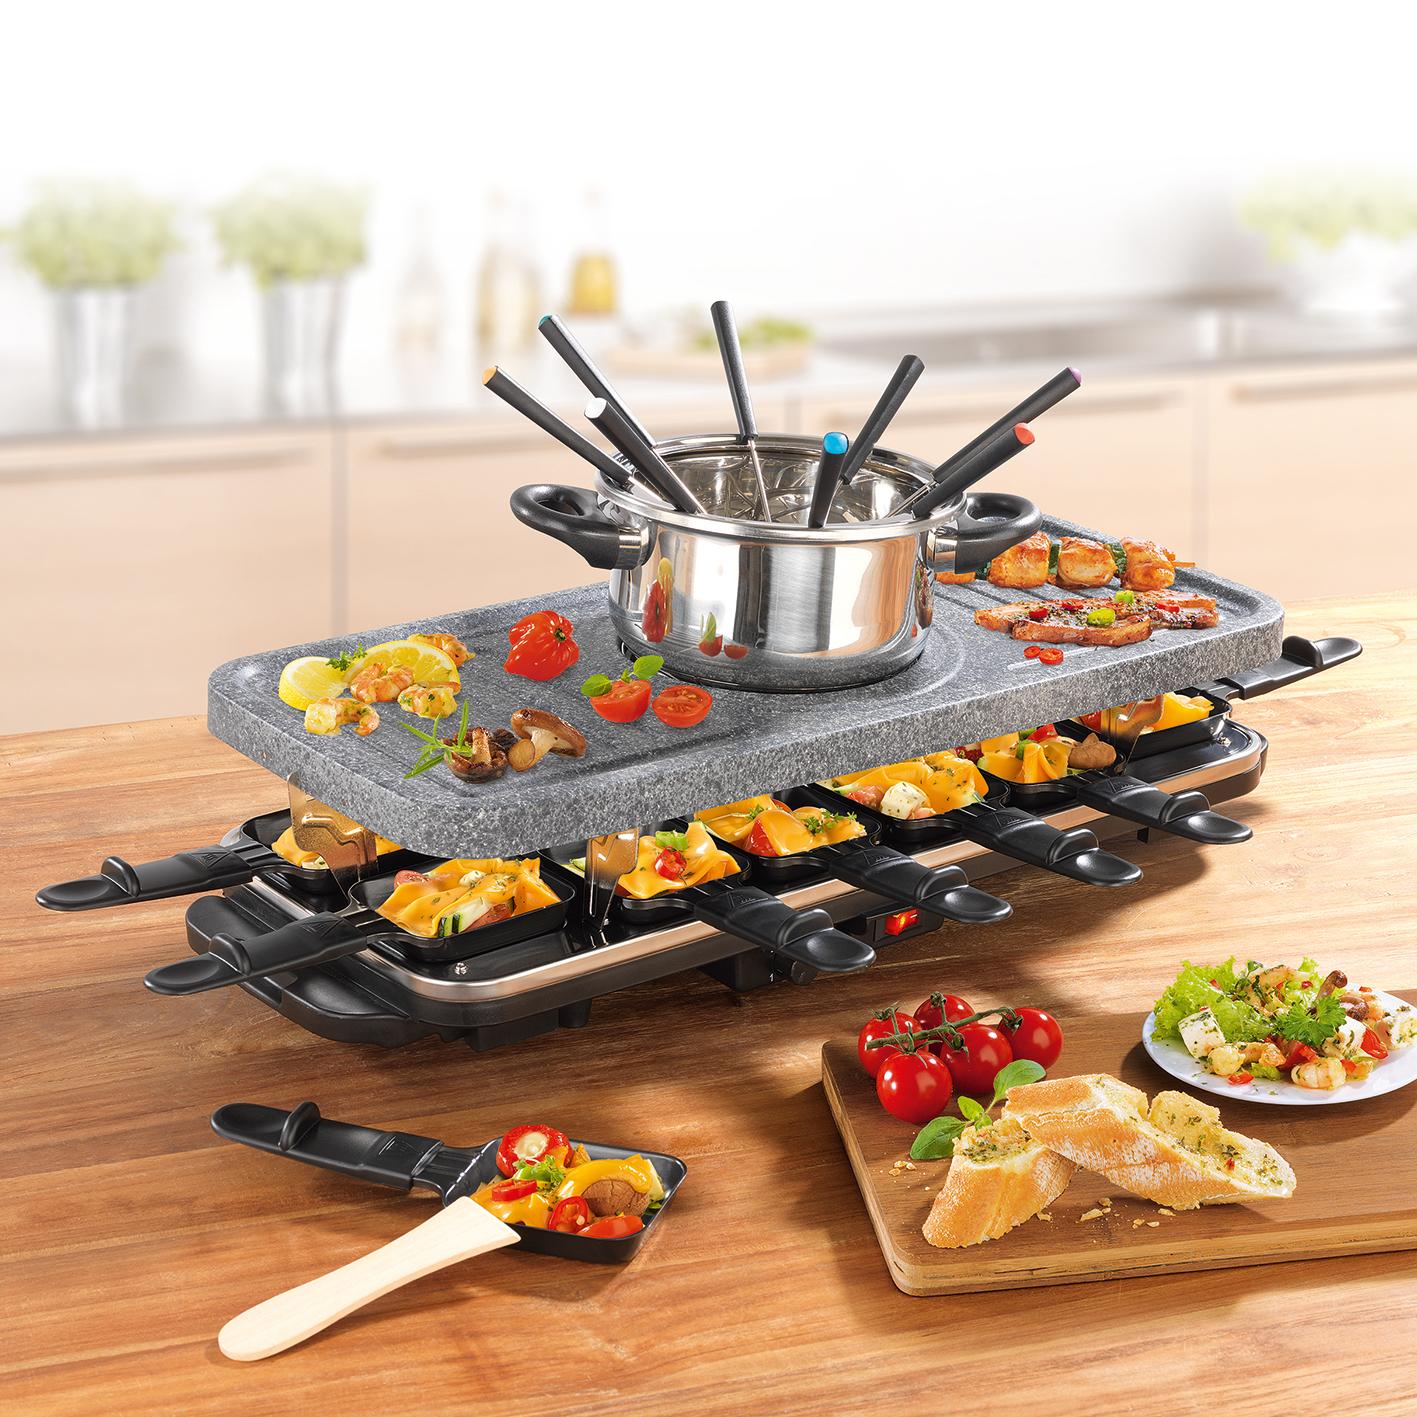 gourmetmaxx raclette fondue set f r 12 personen 1600w grill hei er stein ebay. Black Bedroom Furniture Sets. Home Design Ideas